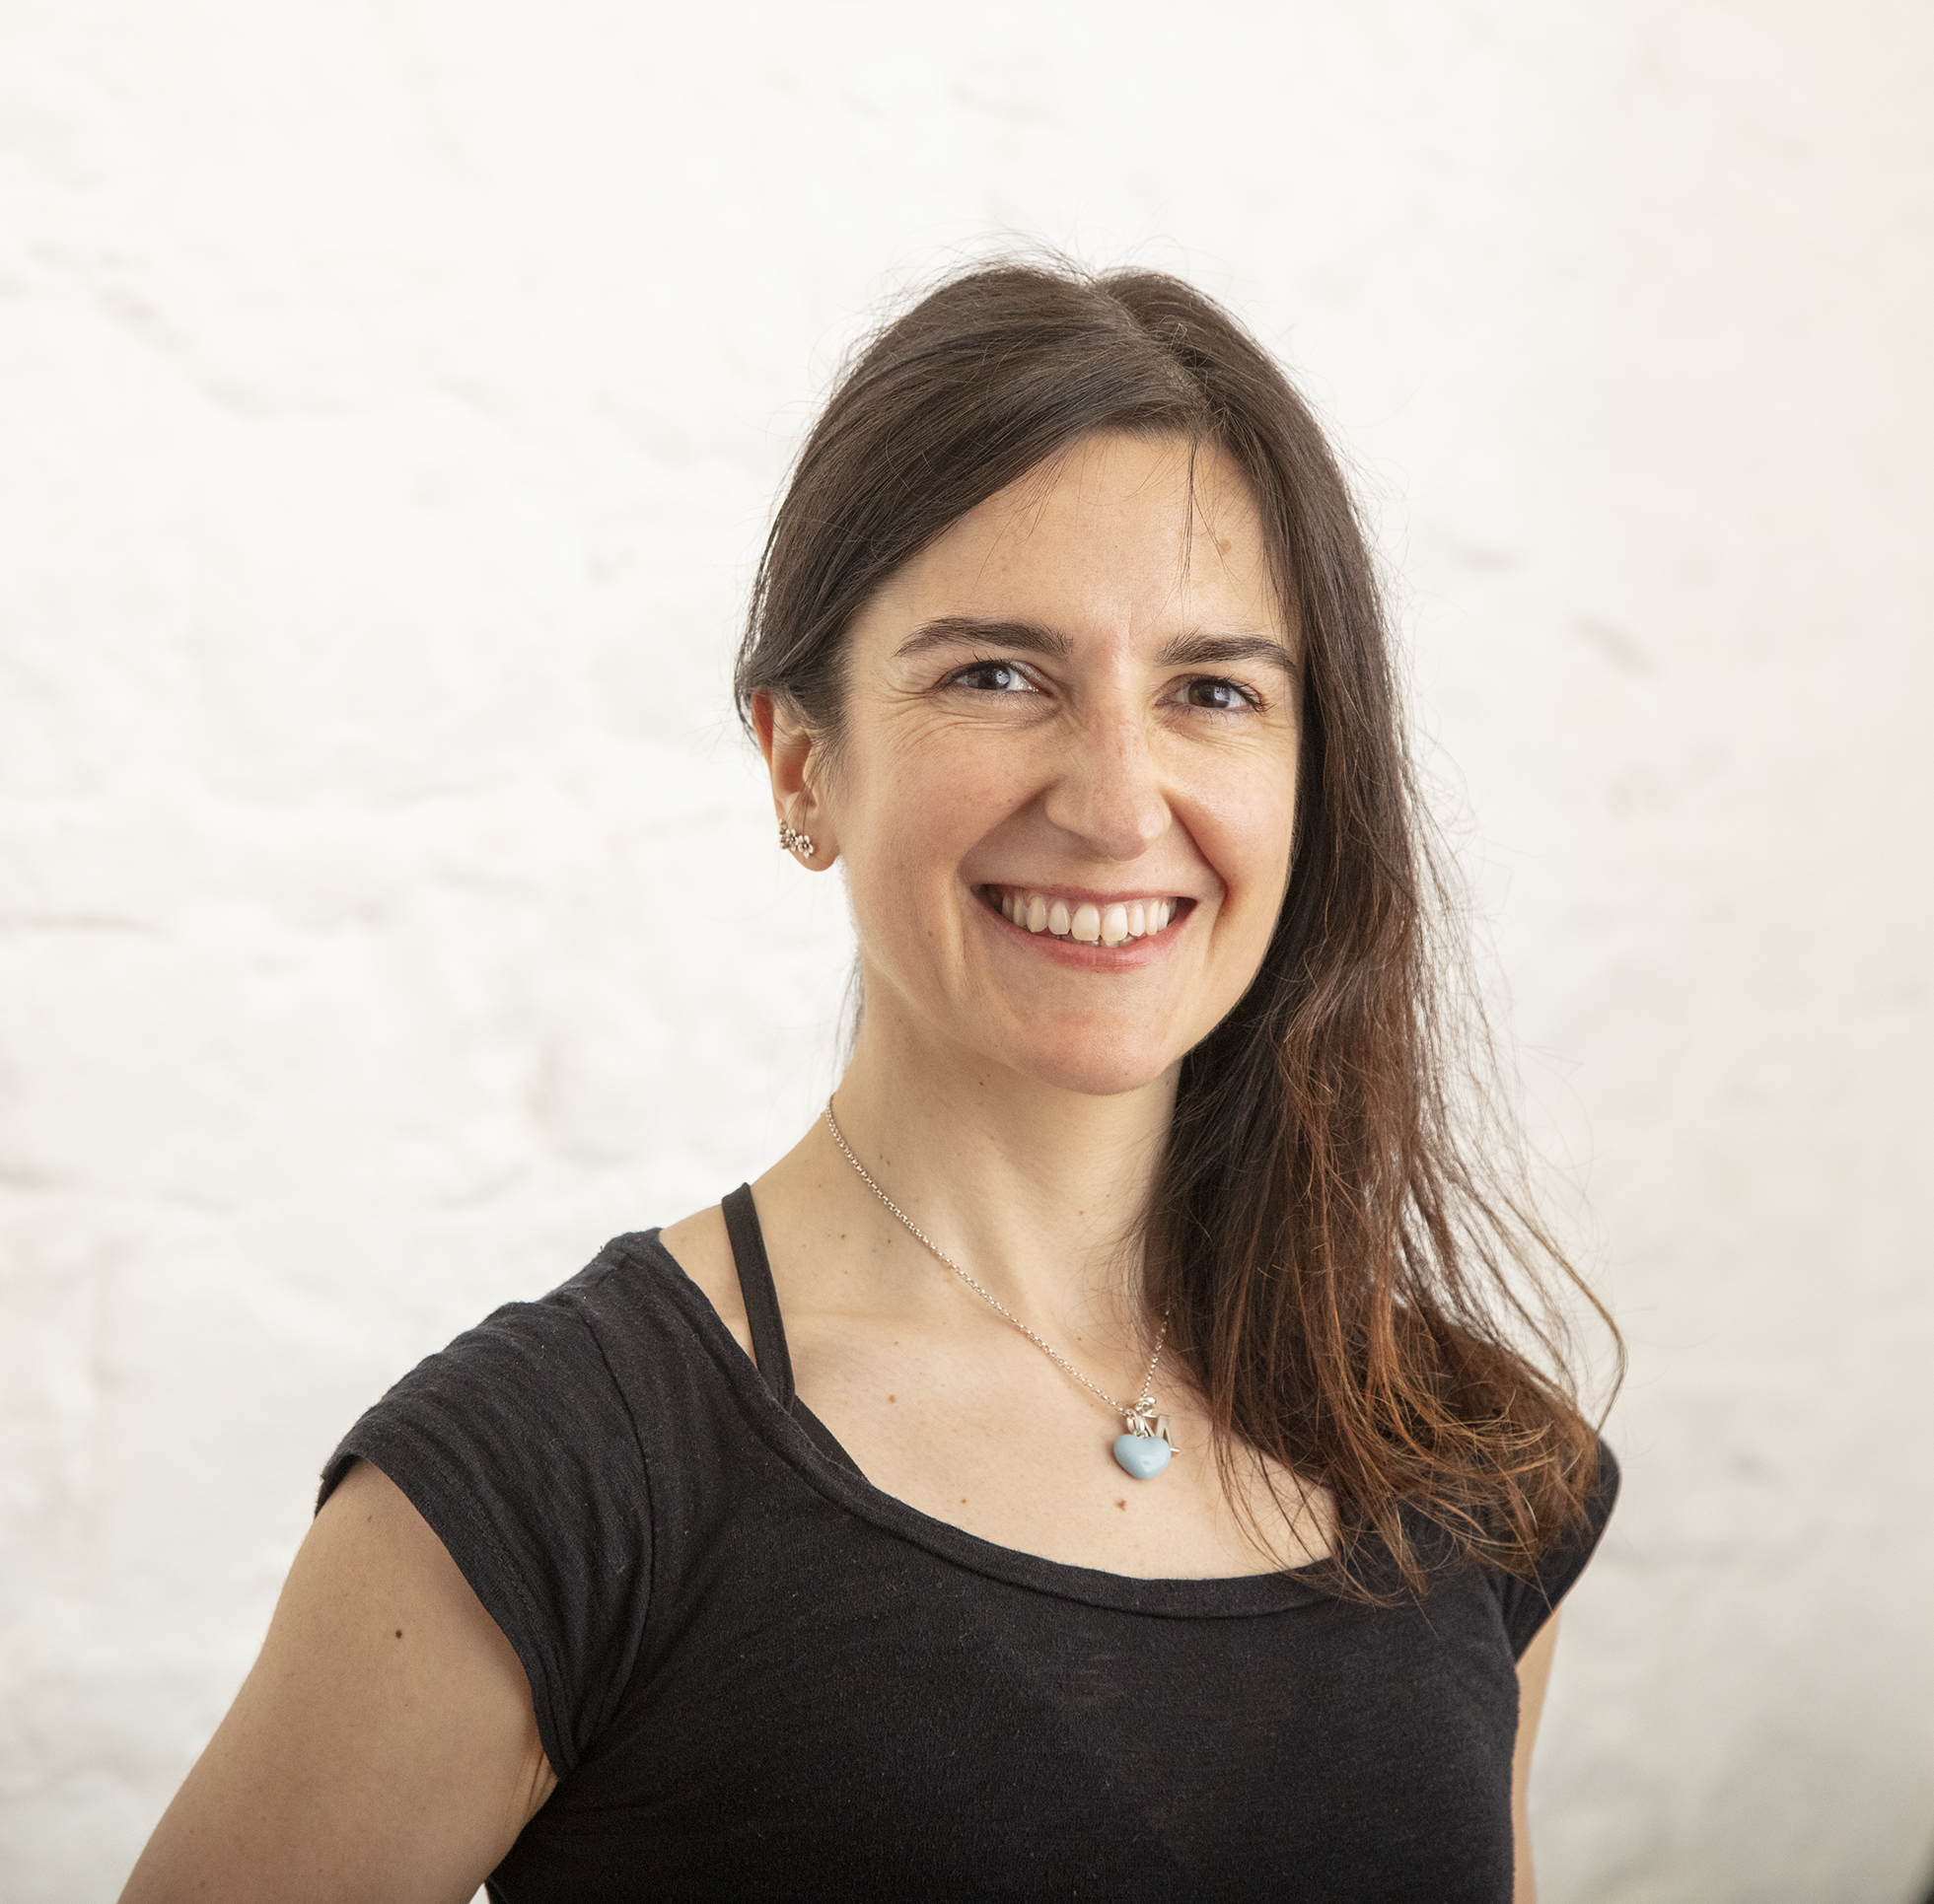 Maider Arrausi Yoga Teacher